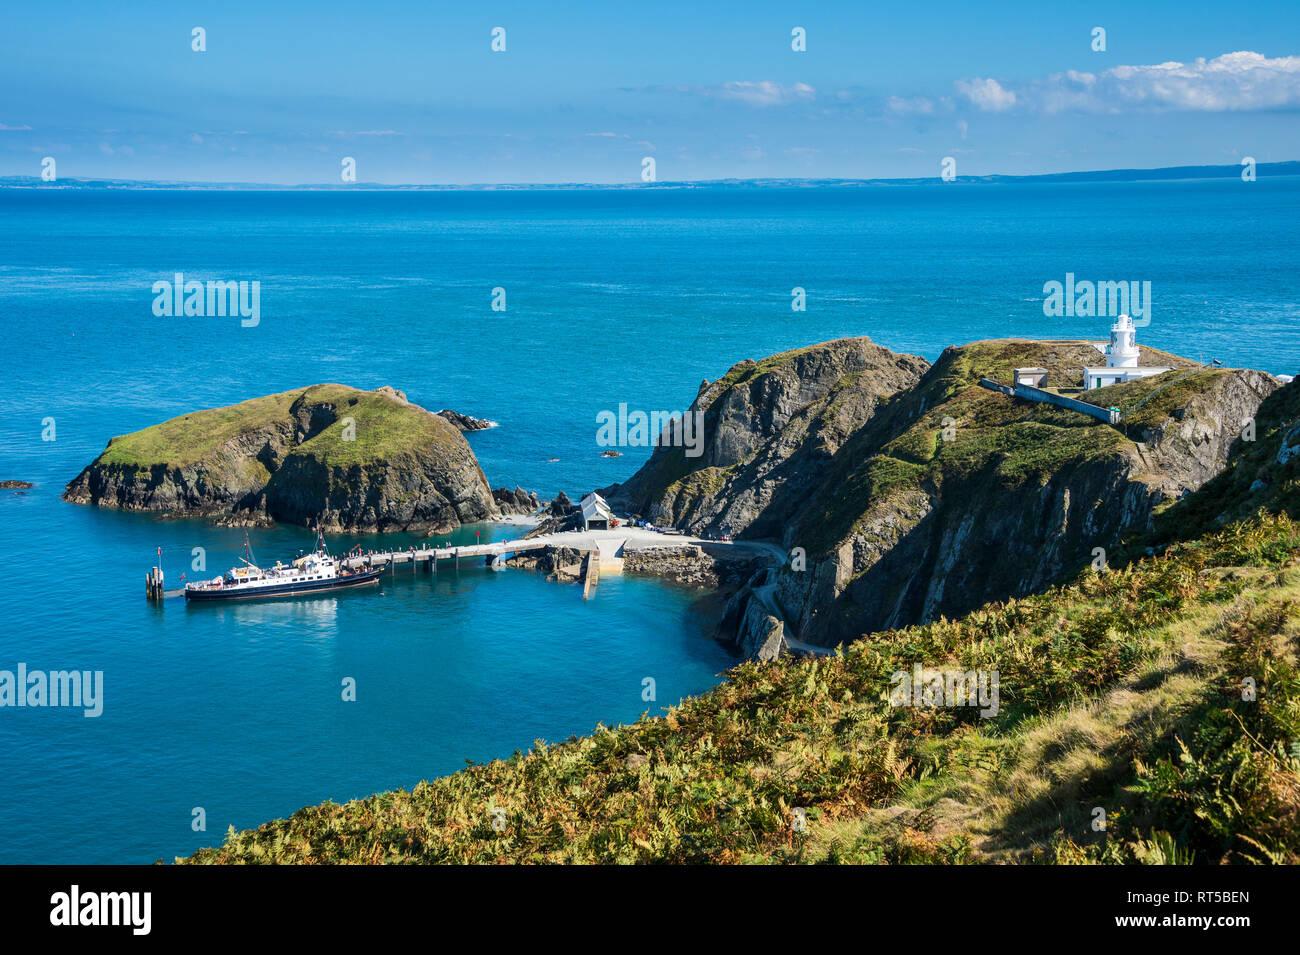 United Kingdom, England, Devon, Island of Lundy, Bristol channel, Harbour Stock Photo